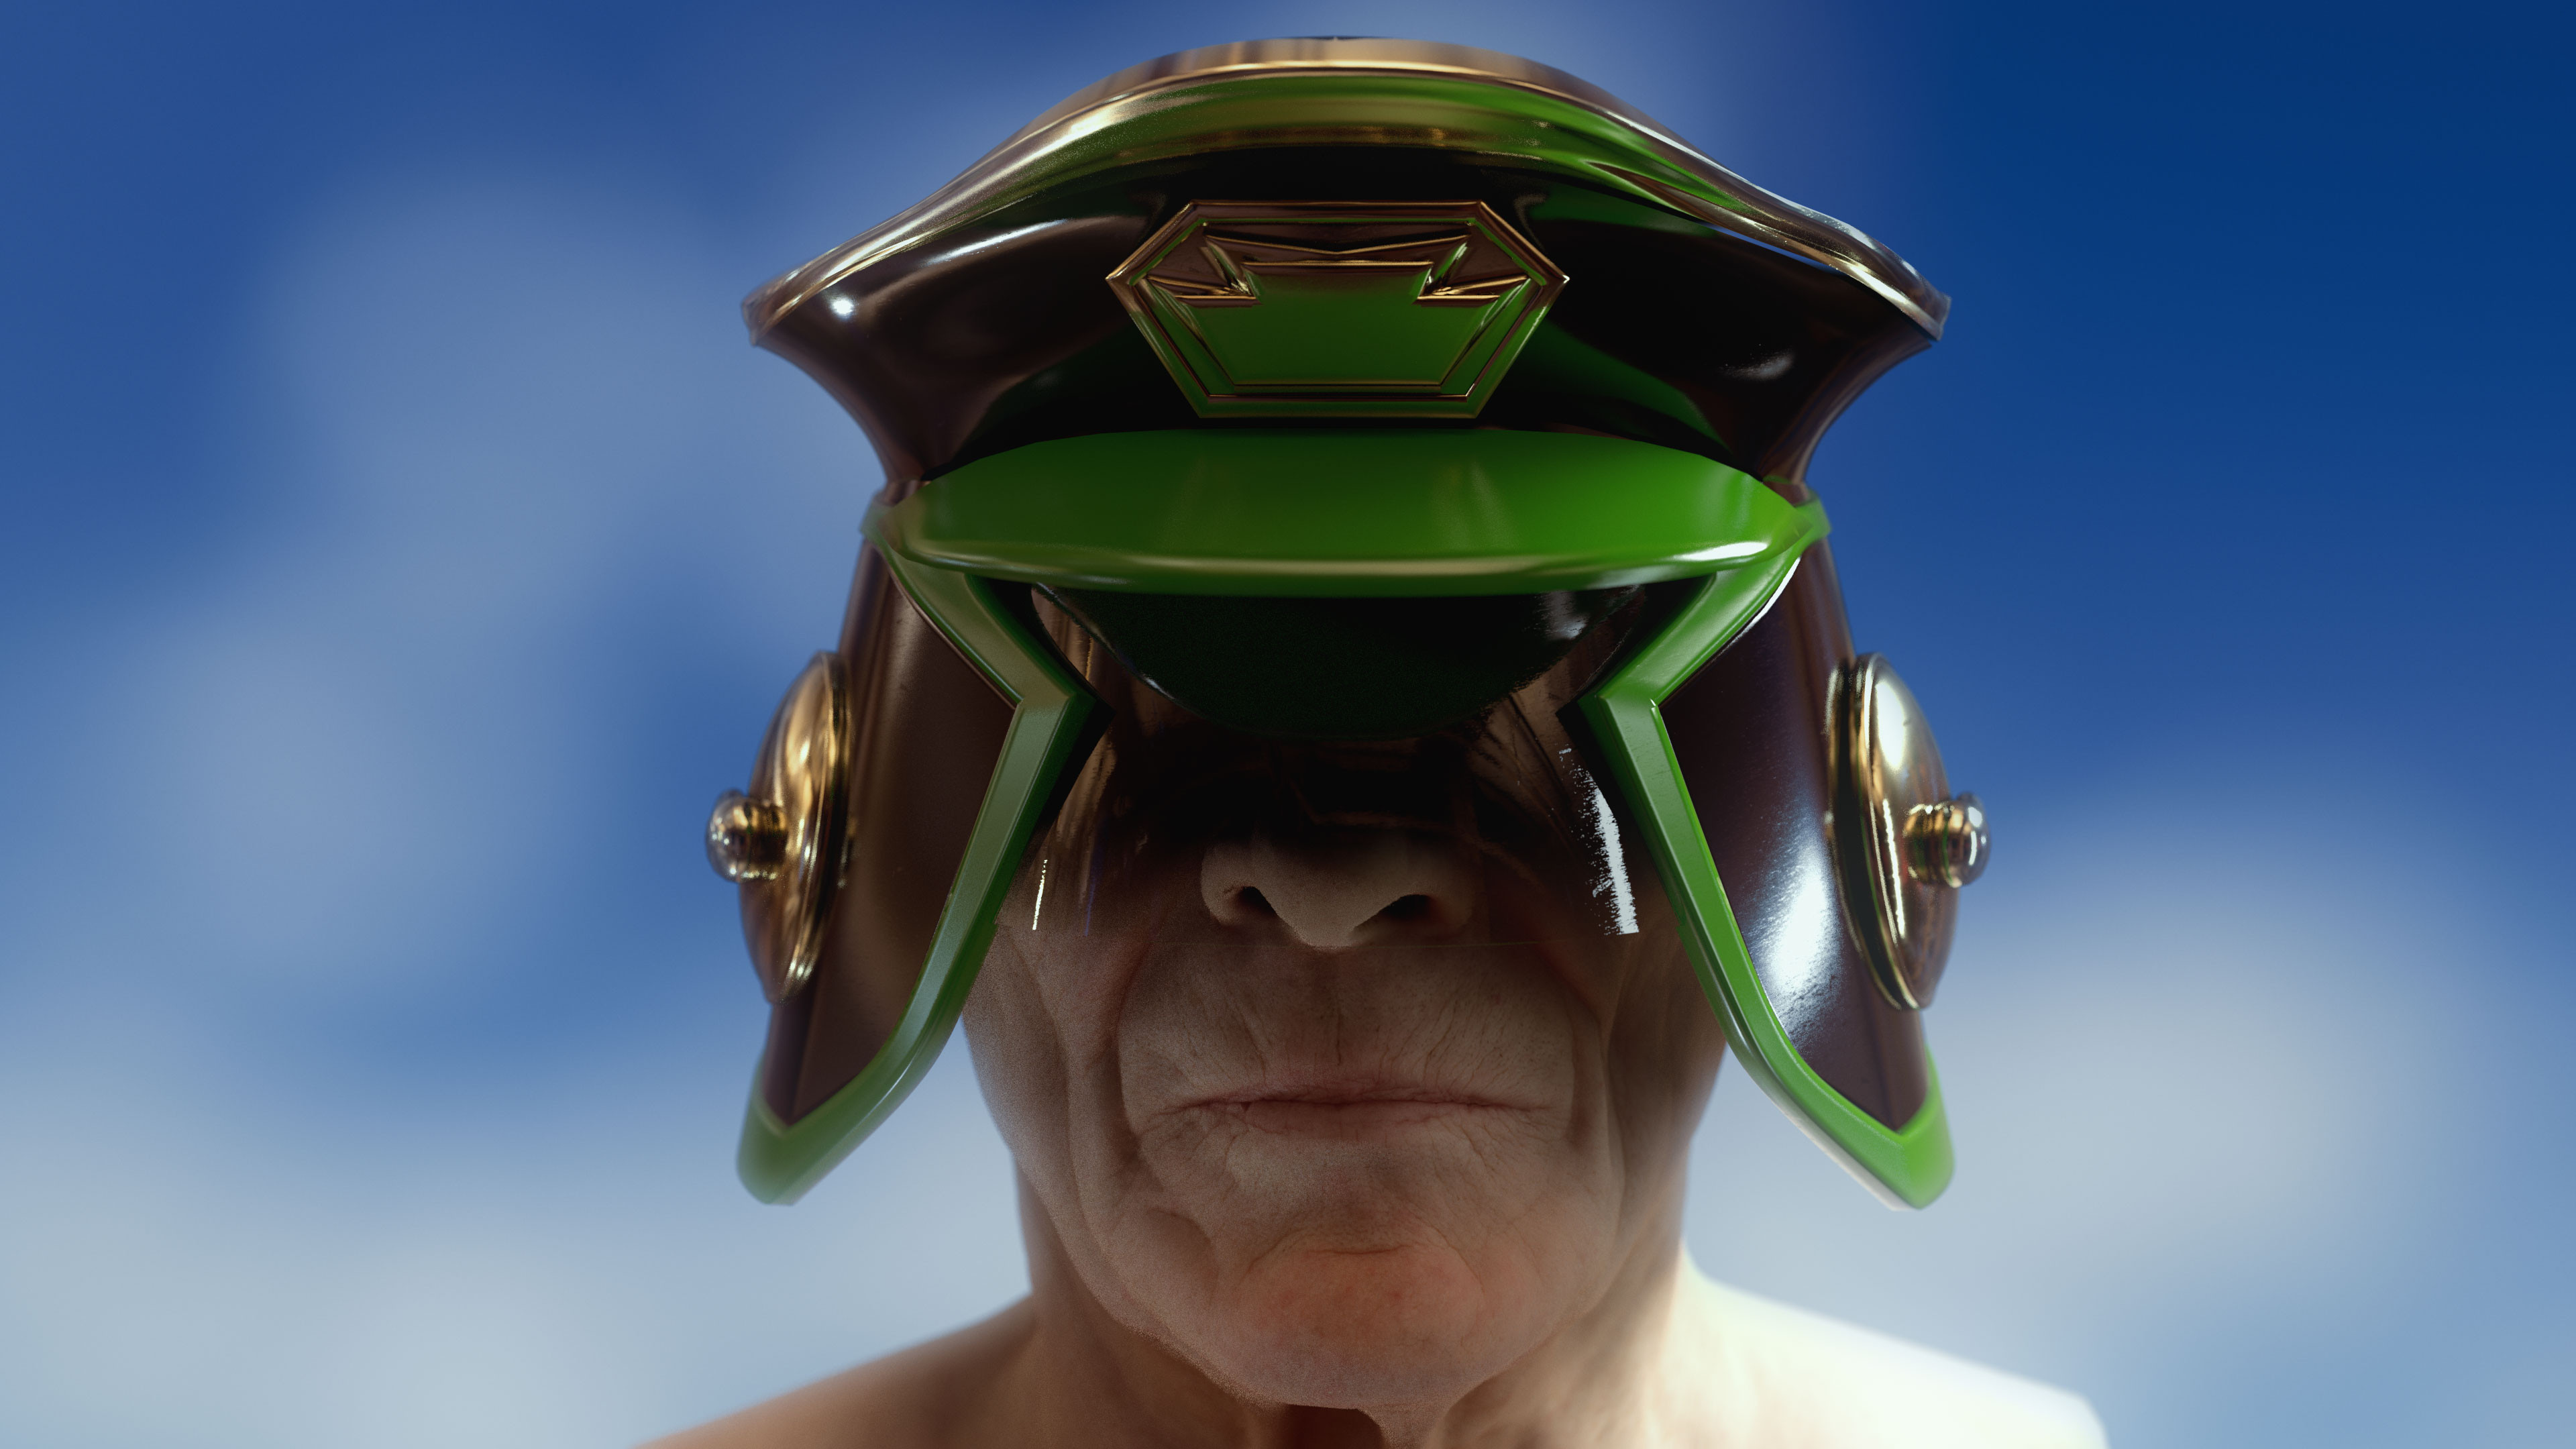 Oz Judge Helmet based on a design by Brendan McCarthy (Head sculpt by Ten24)